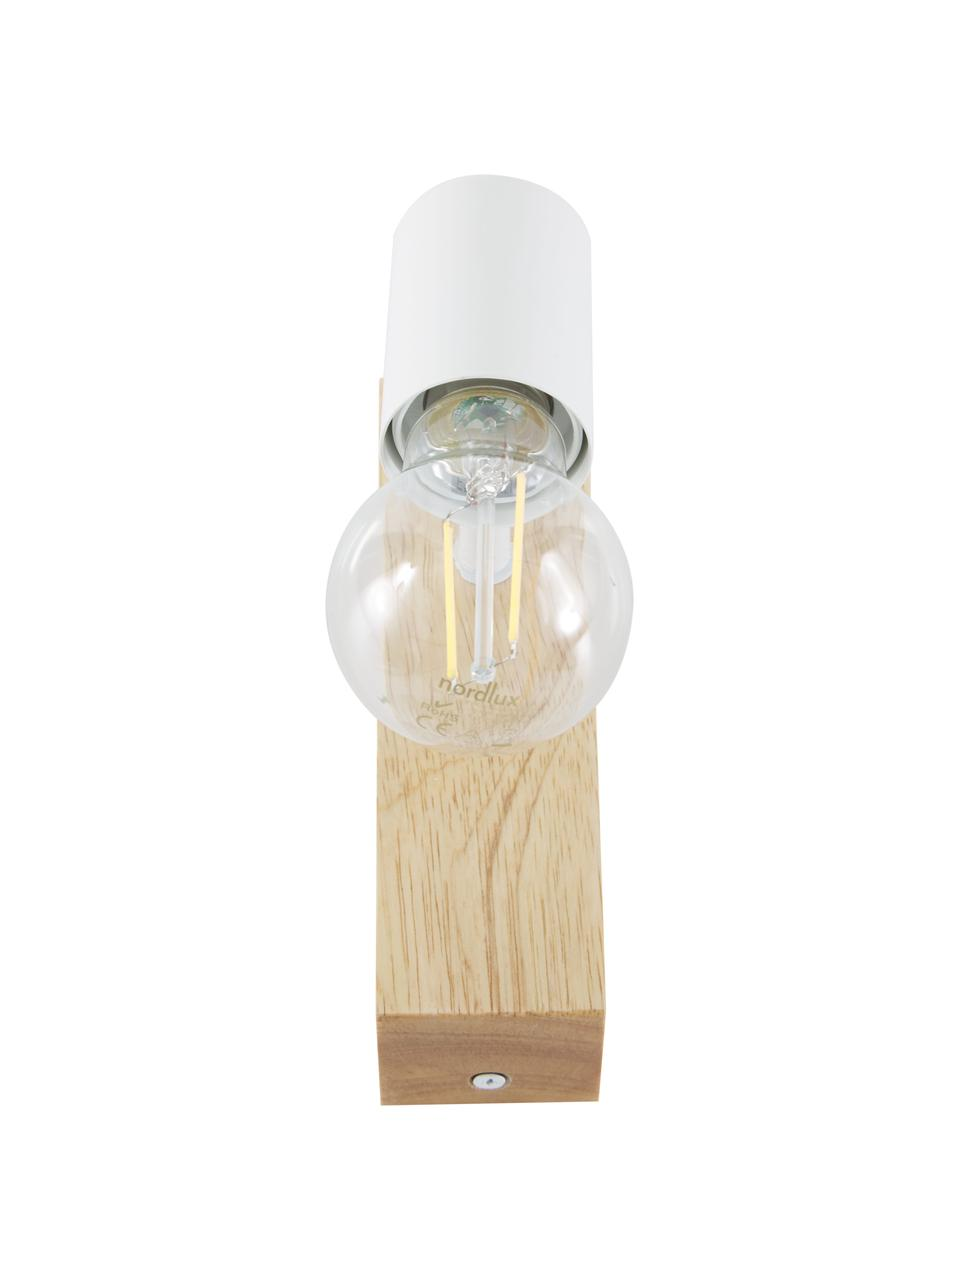 Applique con base in legno Townshend, Bianco, legno, Larg. 5 x Alt. 17 cm